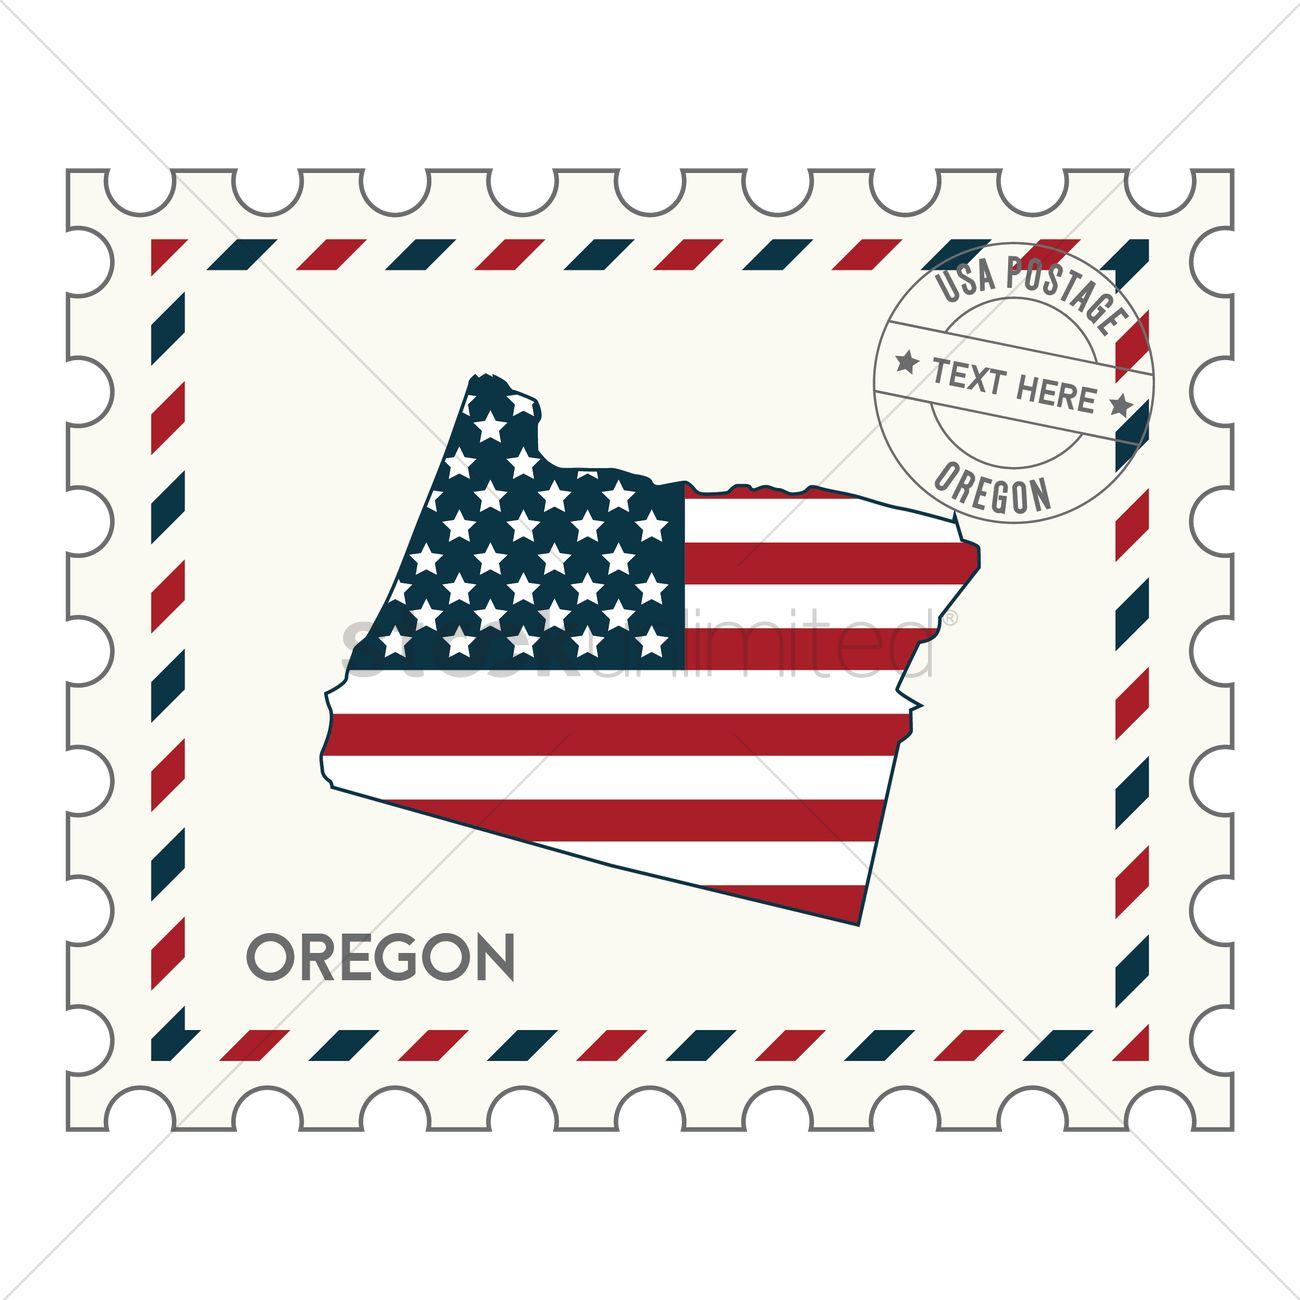 Astonishing Oregon Postage Stamp Vector Graphic Oregon Postage Stamp Vector Image Stockunlimited Postcard Stamp Value Post Card Stamp Cost inspiration Post Card Stamp